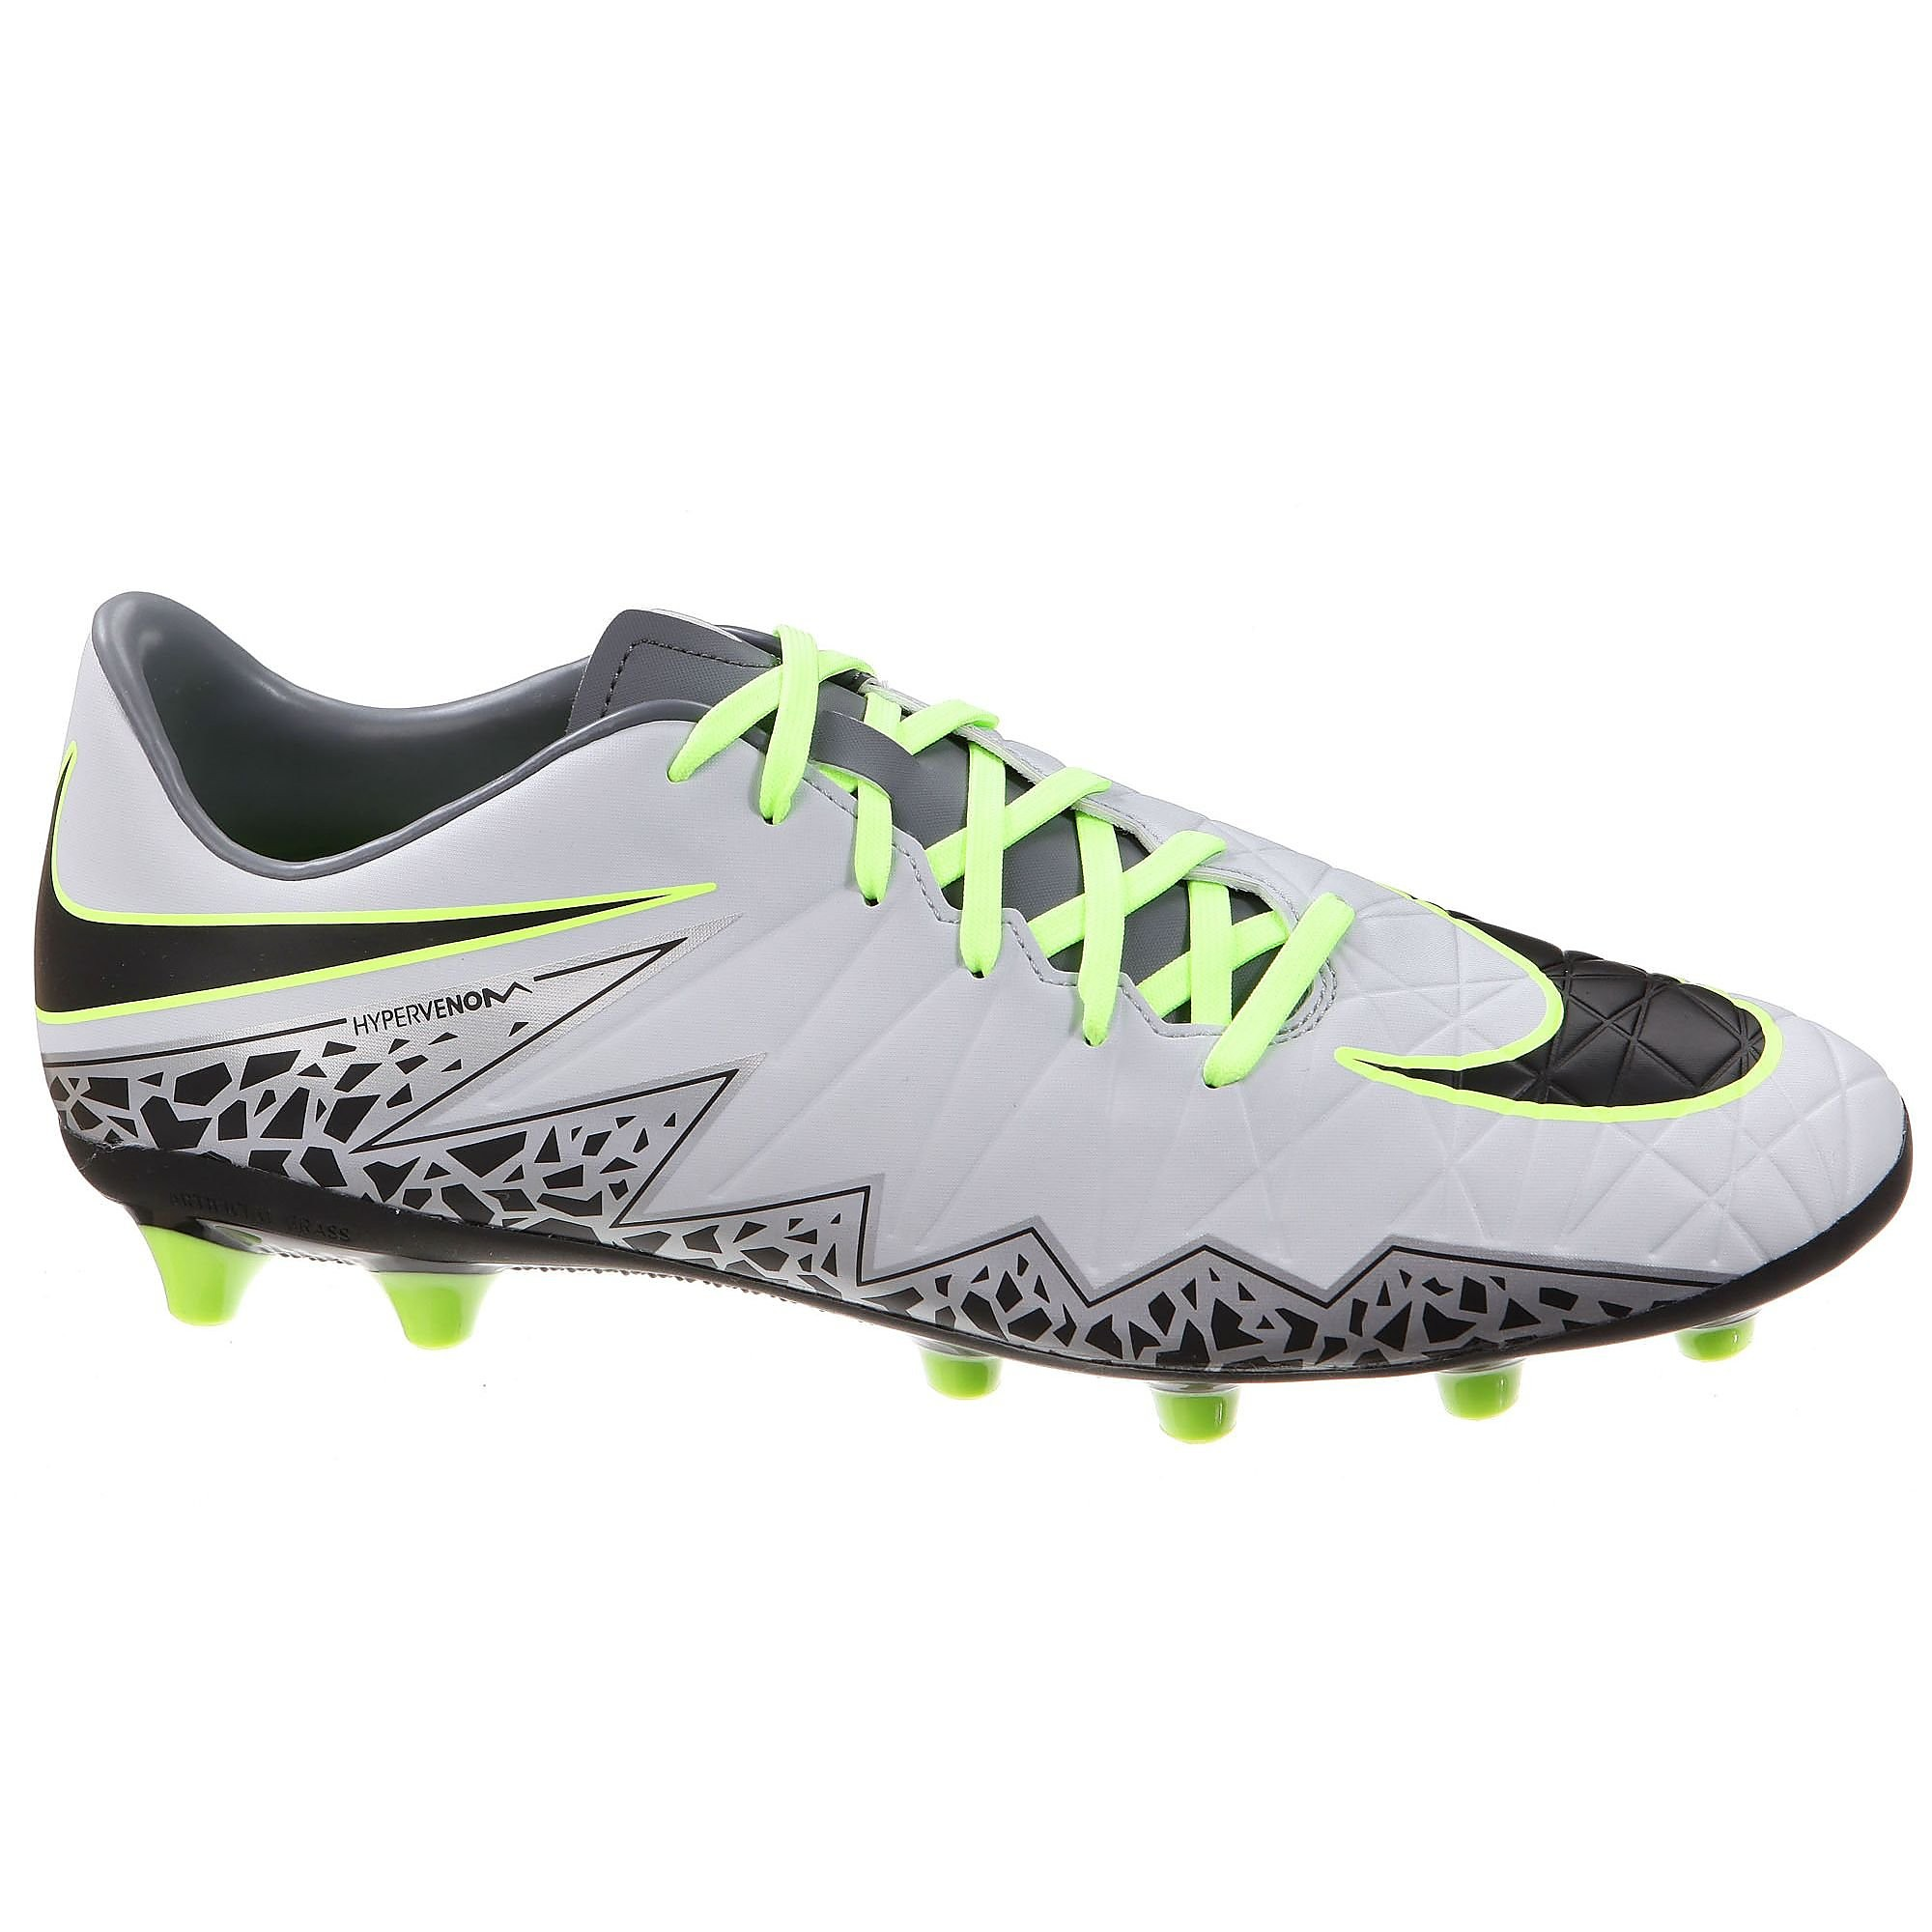 Nike HYPERVENOM PHELON II AG-P